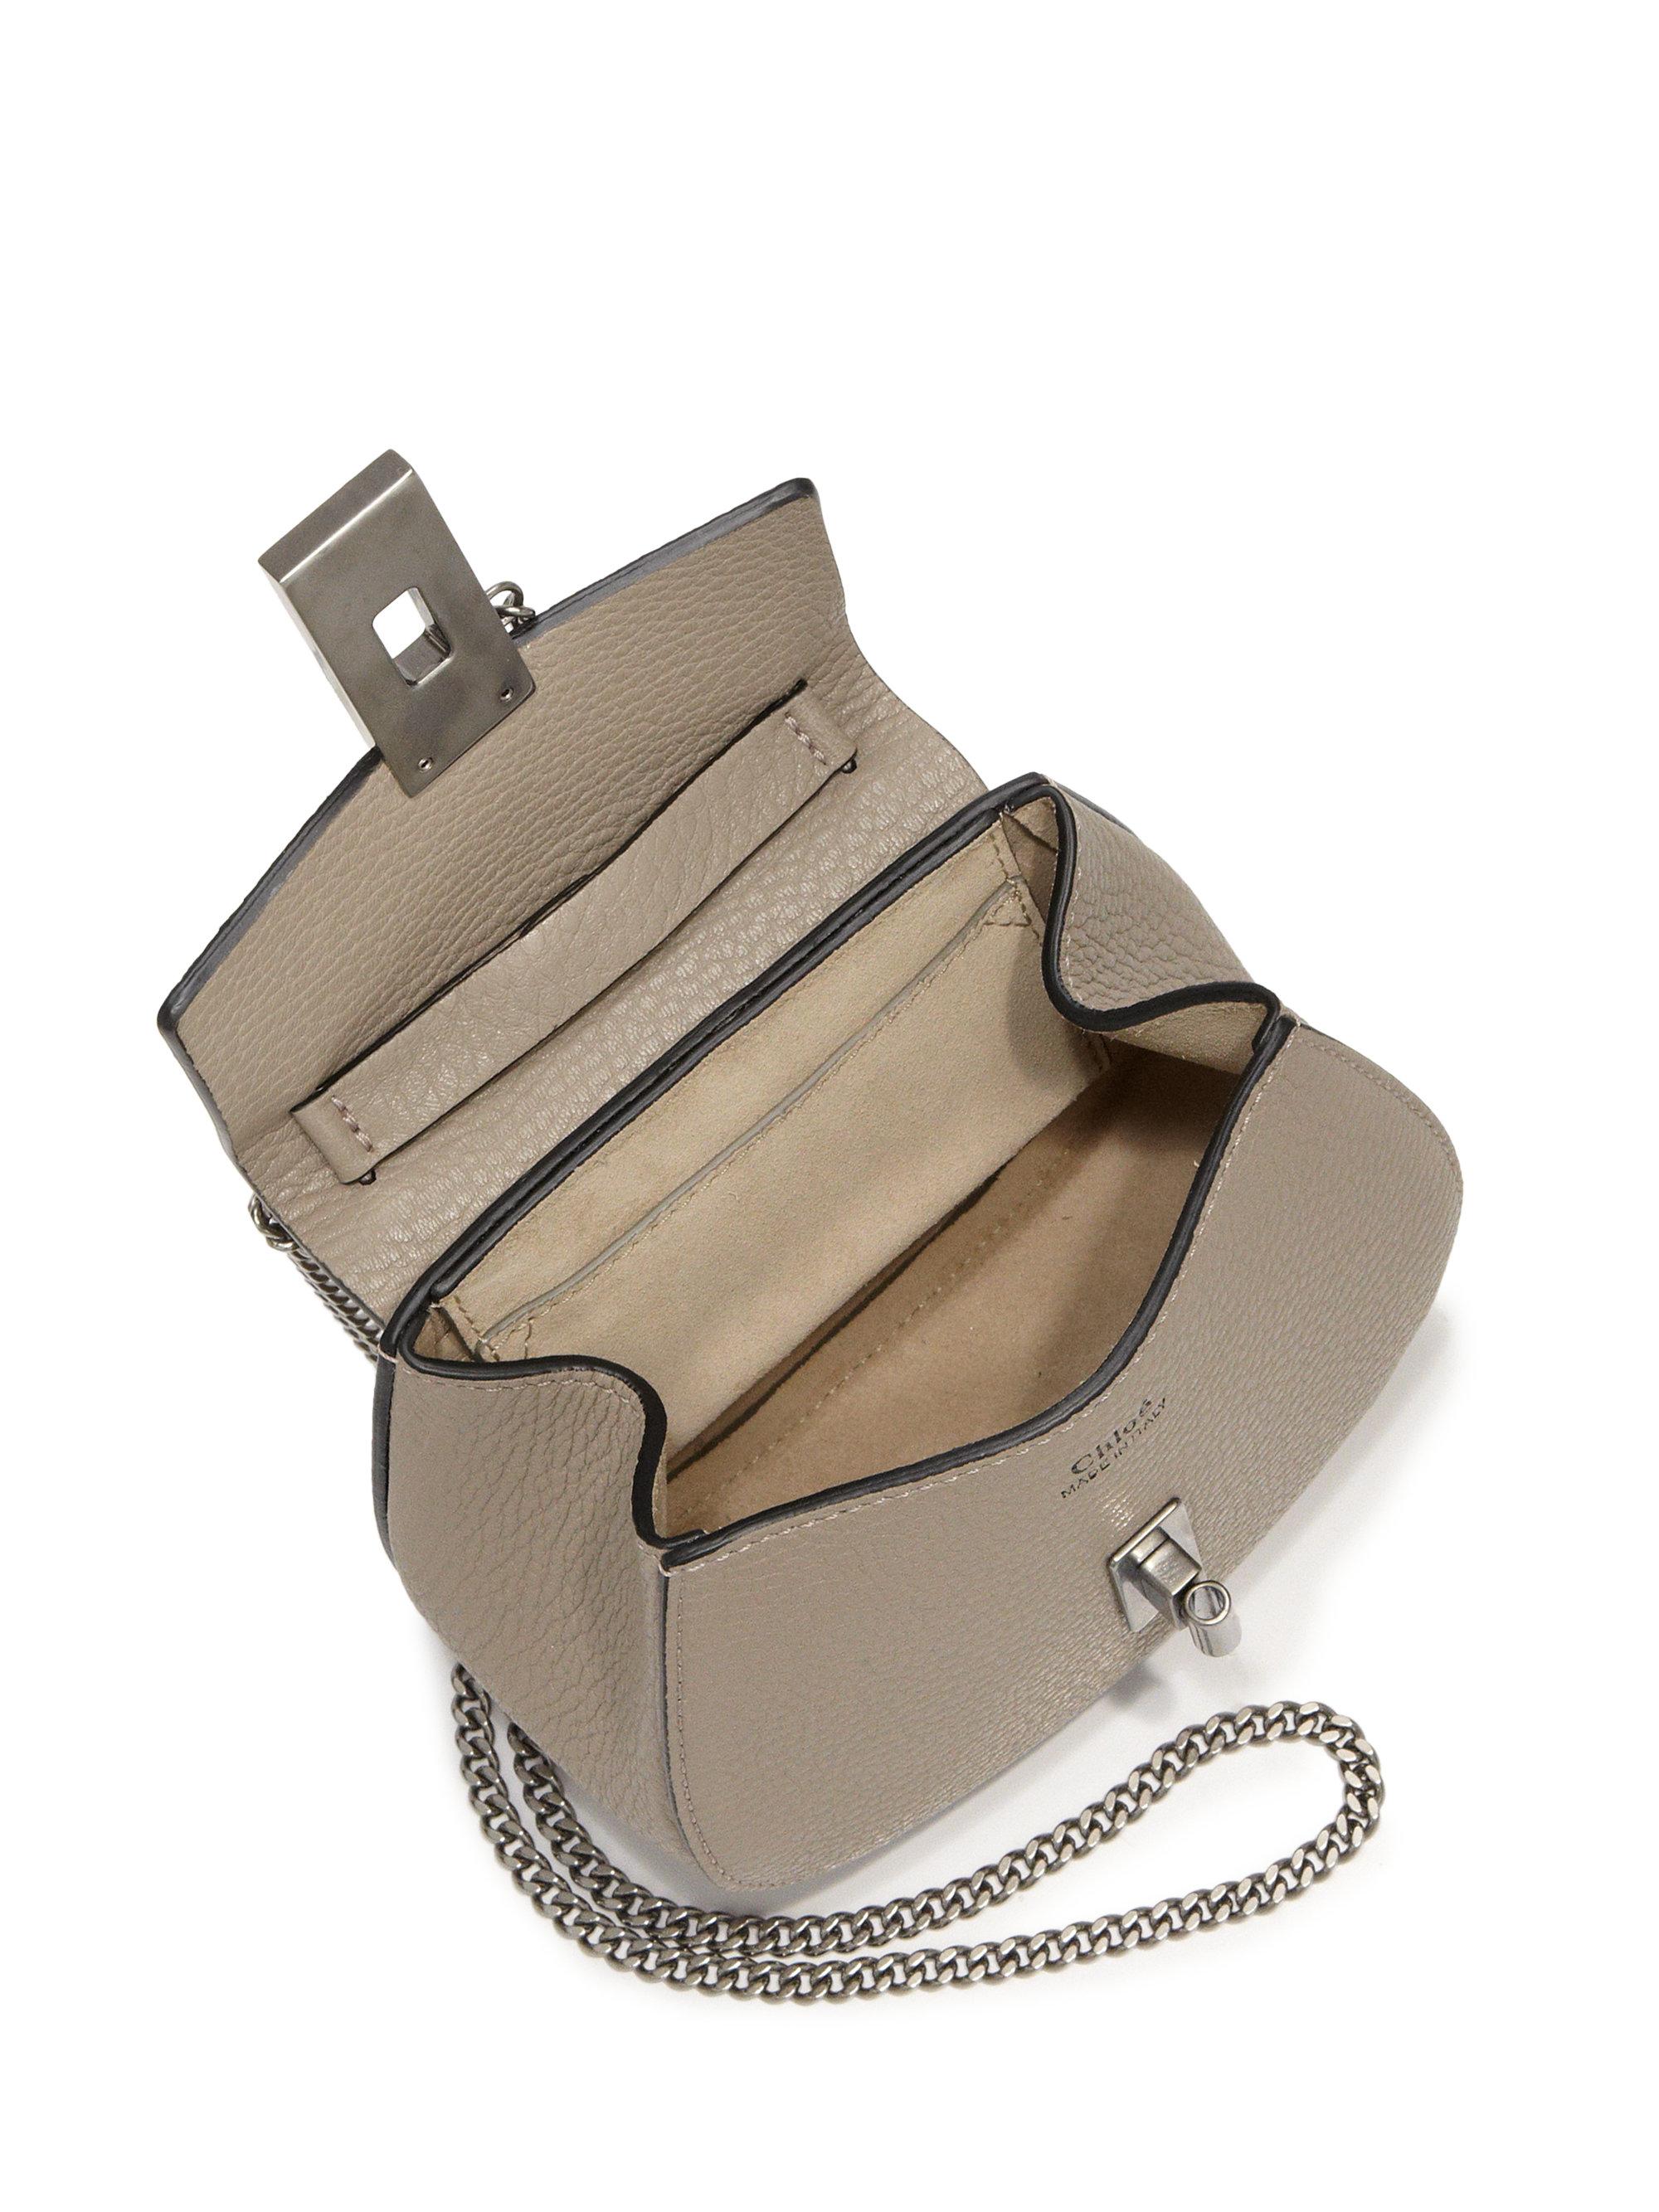 chloe replica shoes - chloe drew nano black textured leather bag